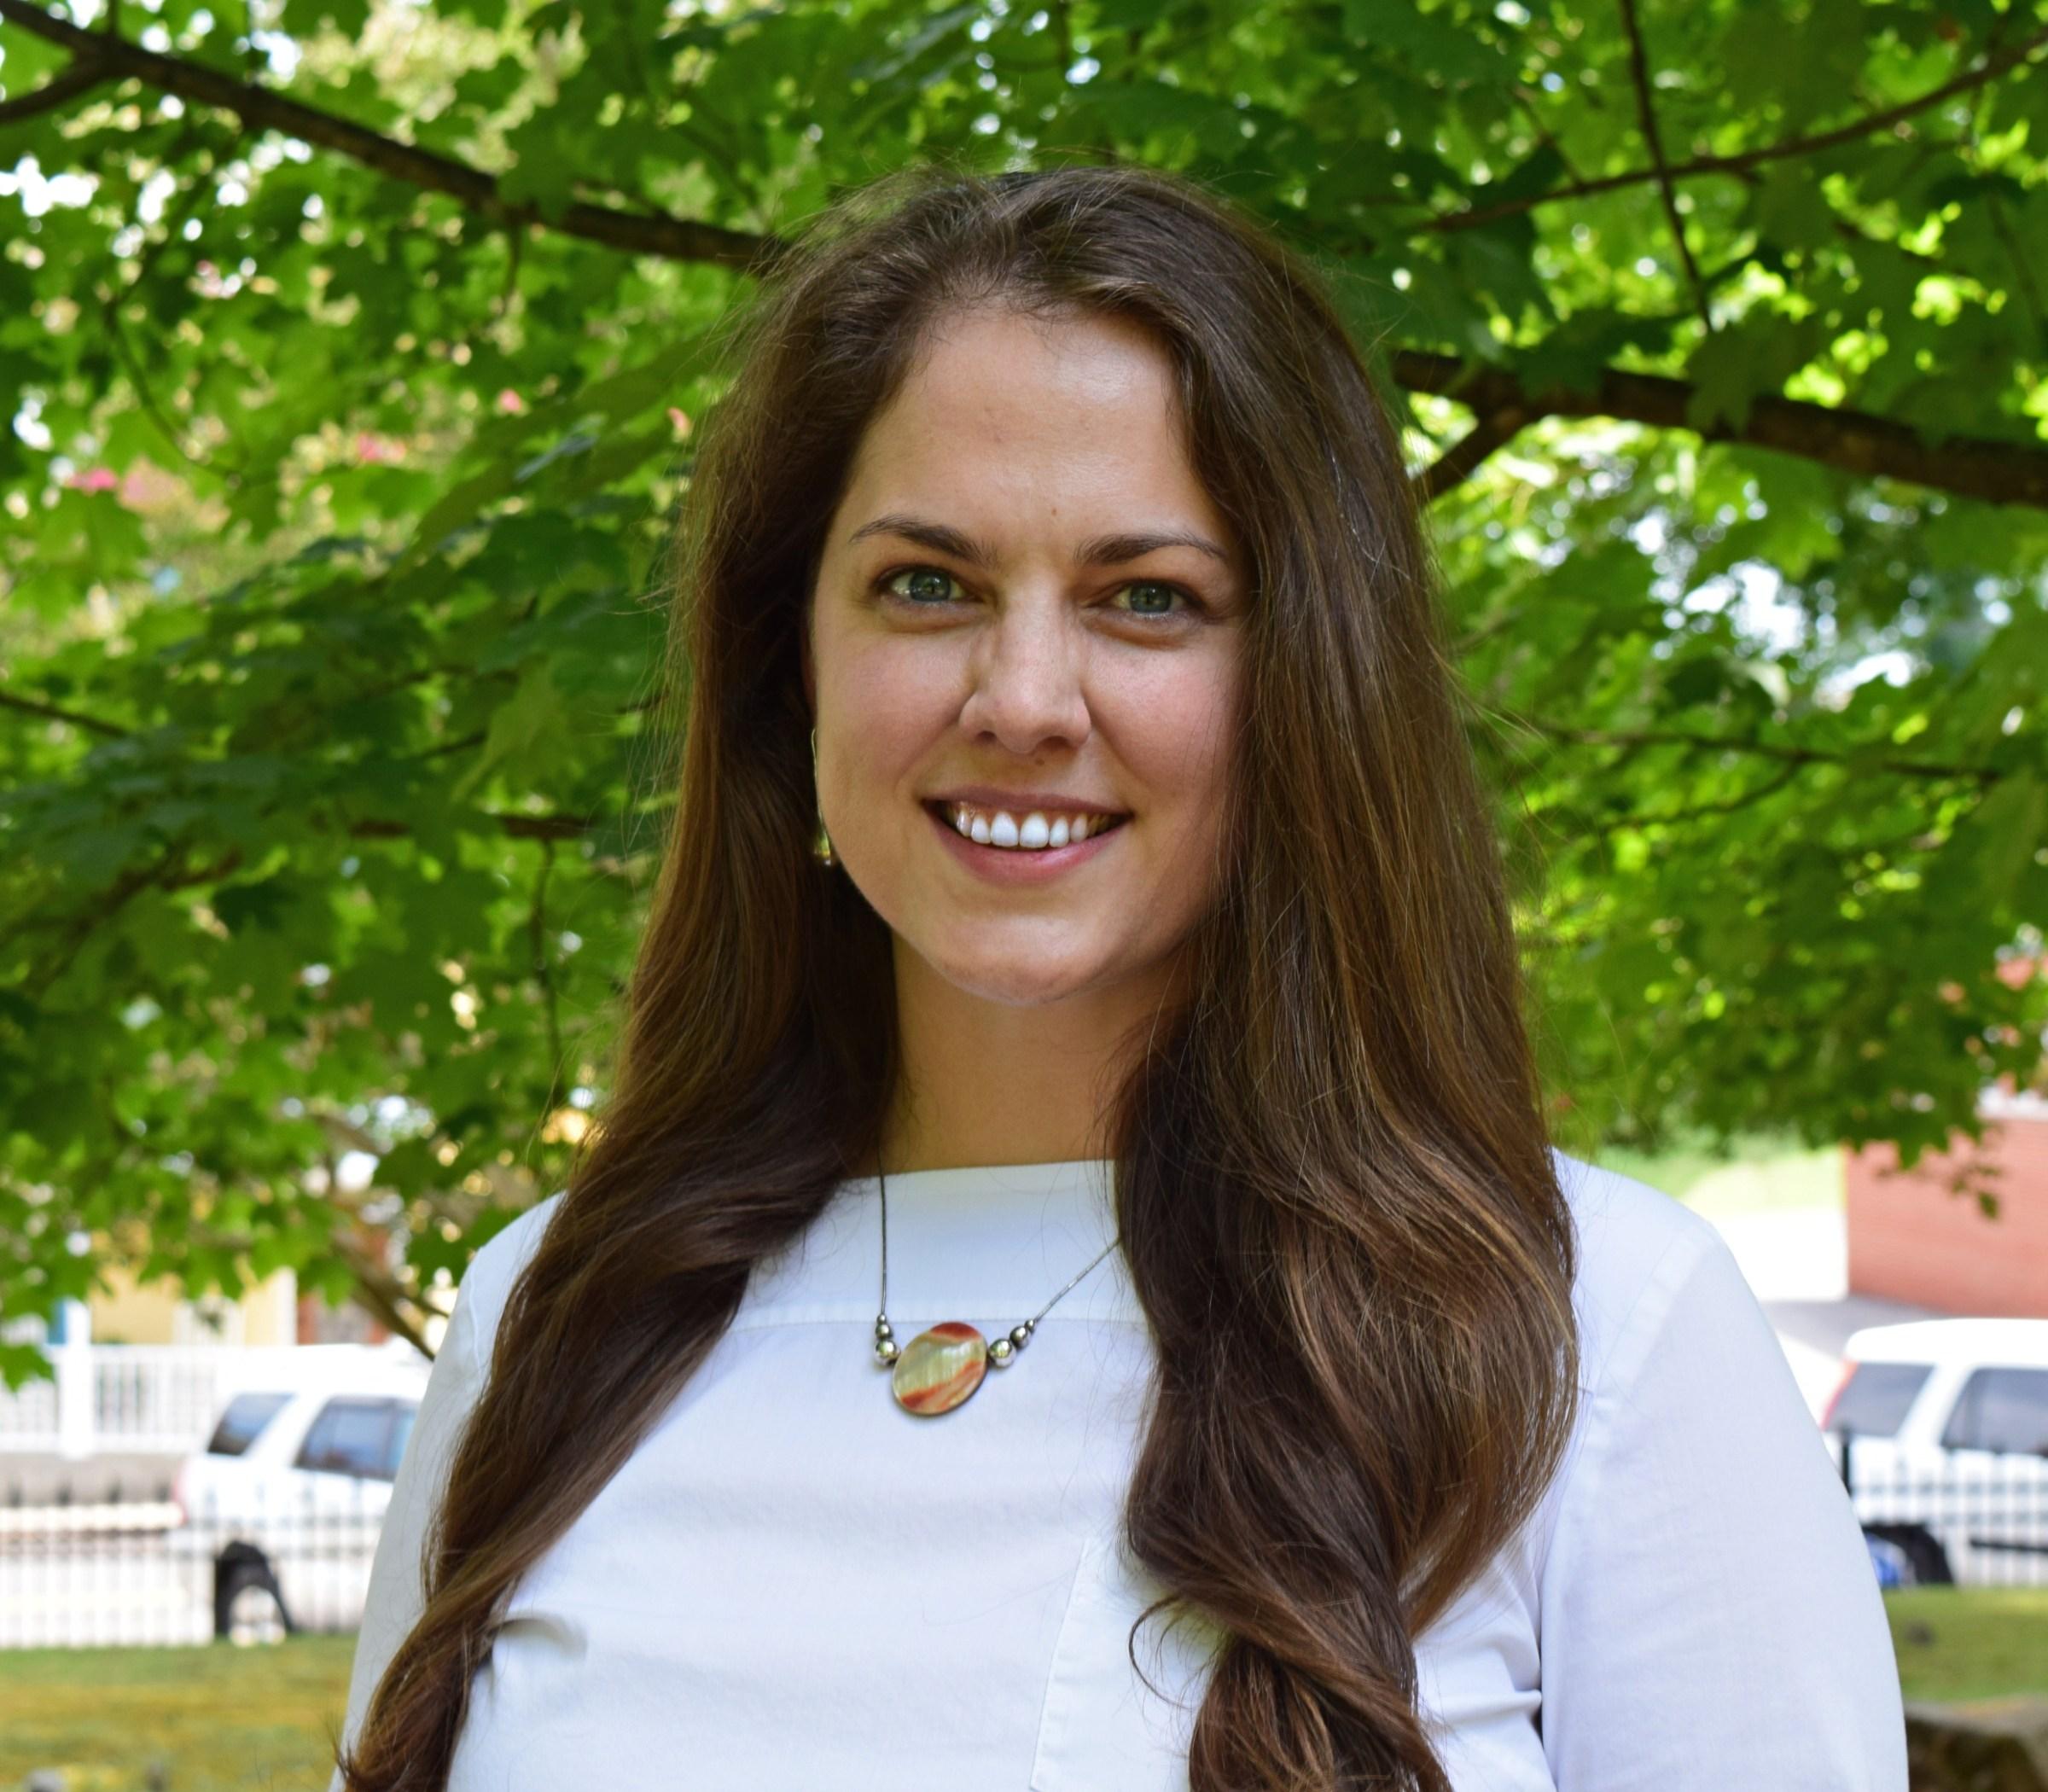 Jefferson County Tourism Director Lauren Hurdle